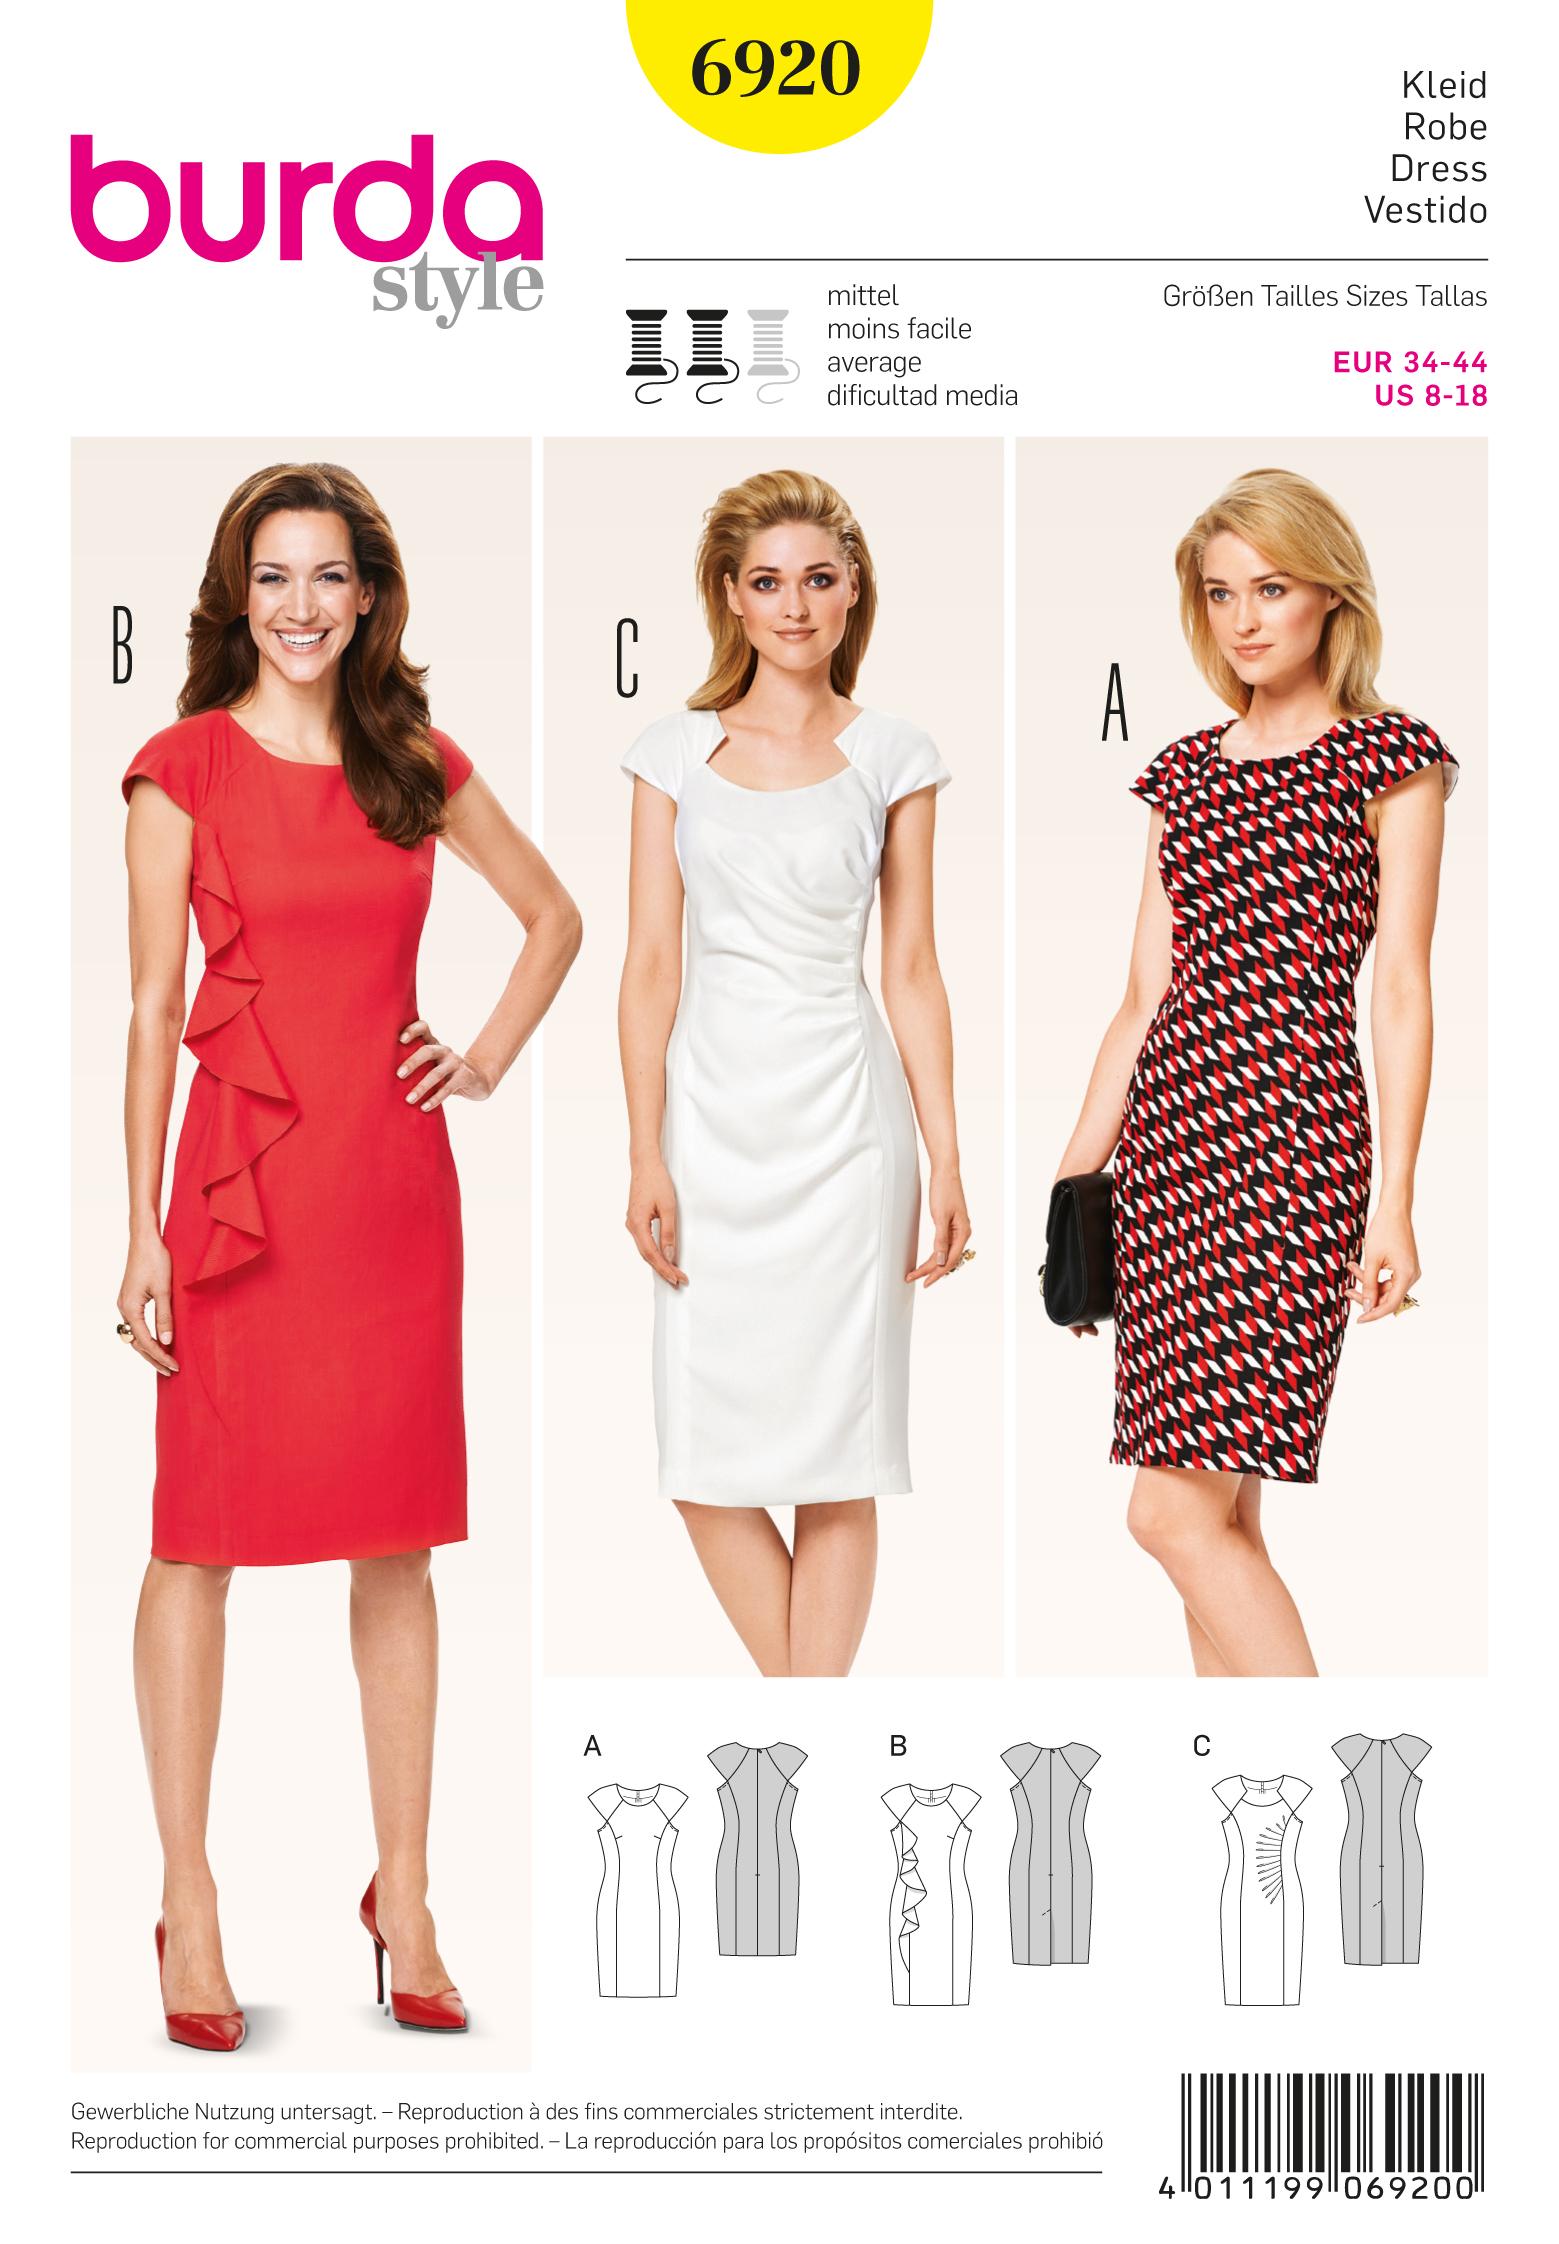 Burda Dresses 6920